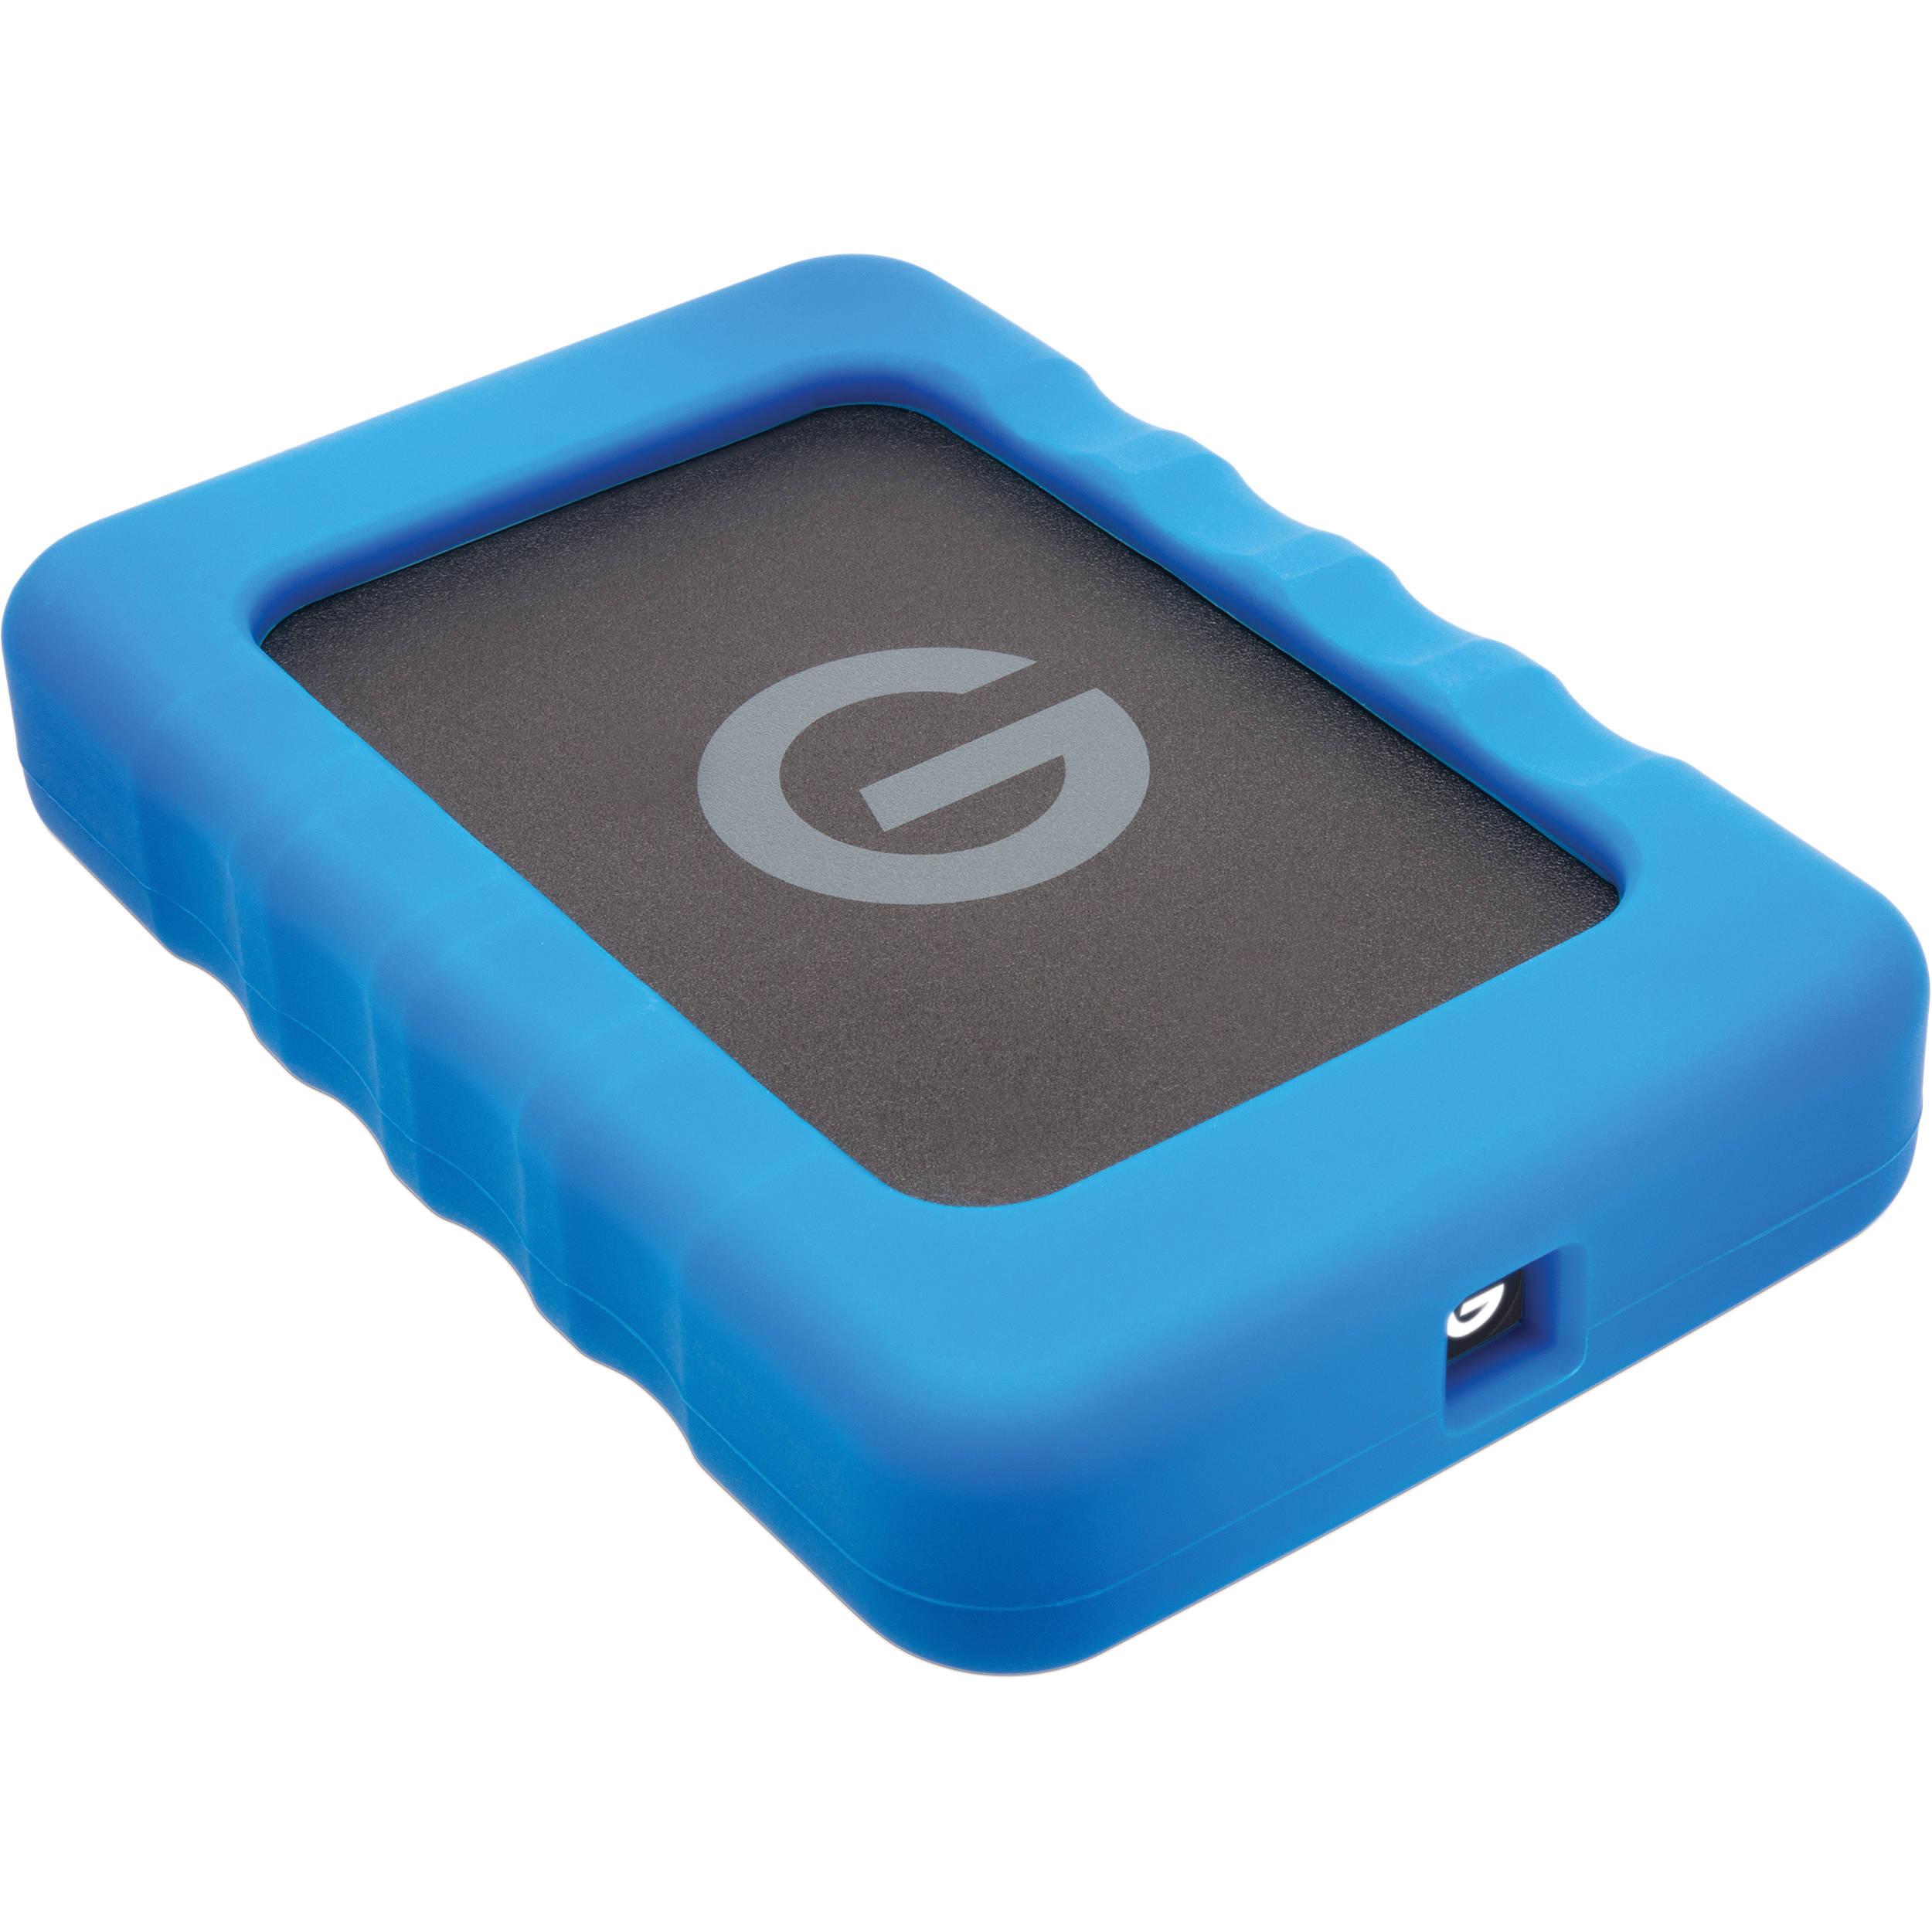 G-Technology 1TB G-DRIVE ev RaW USB 3.0 Hard Drive 0G04101 B&H